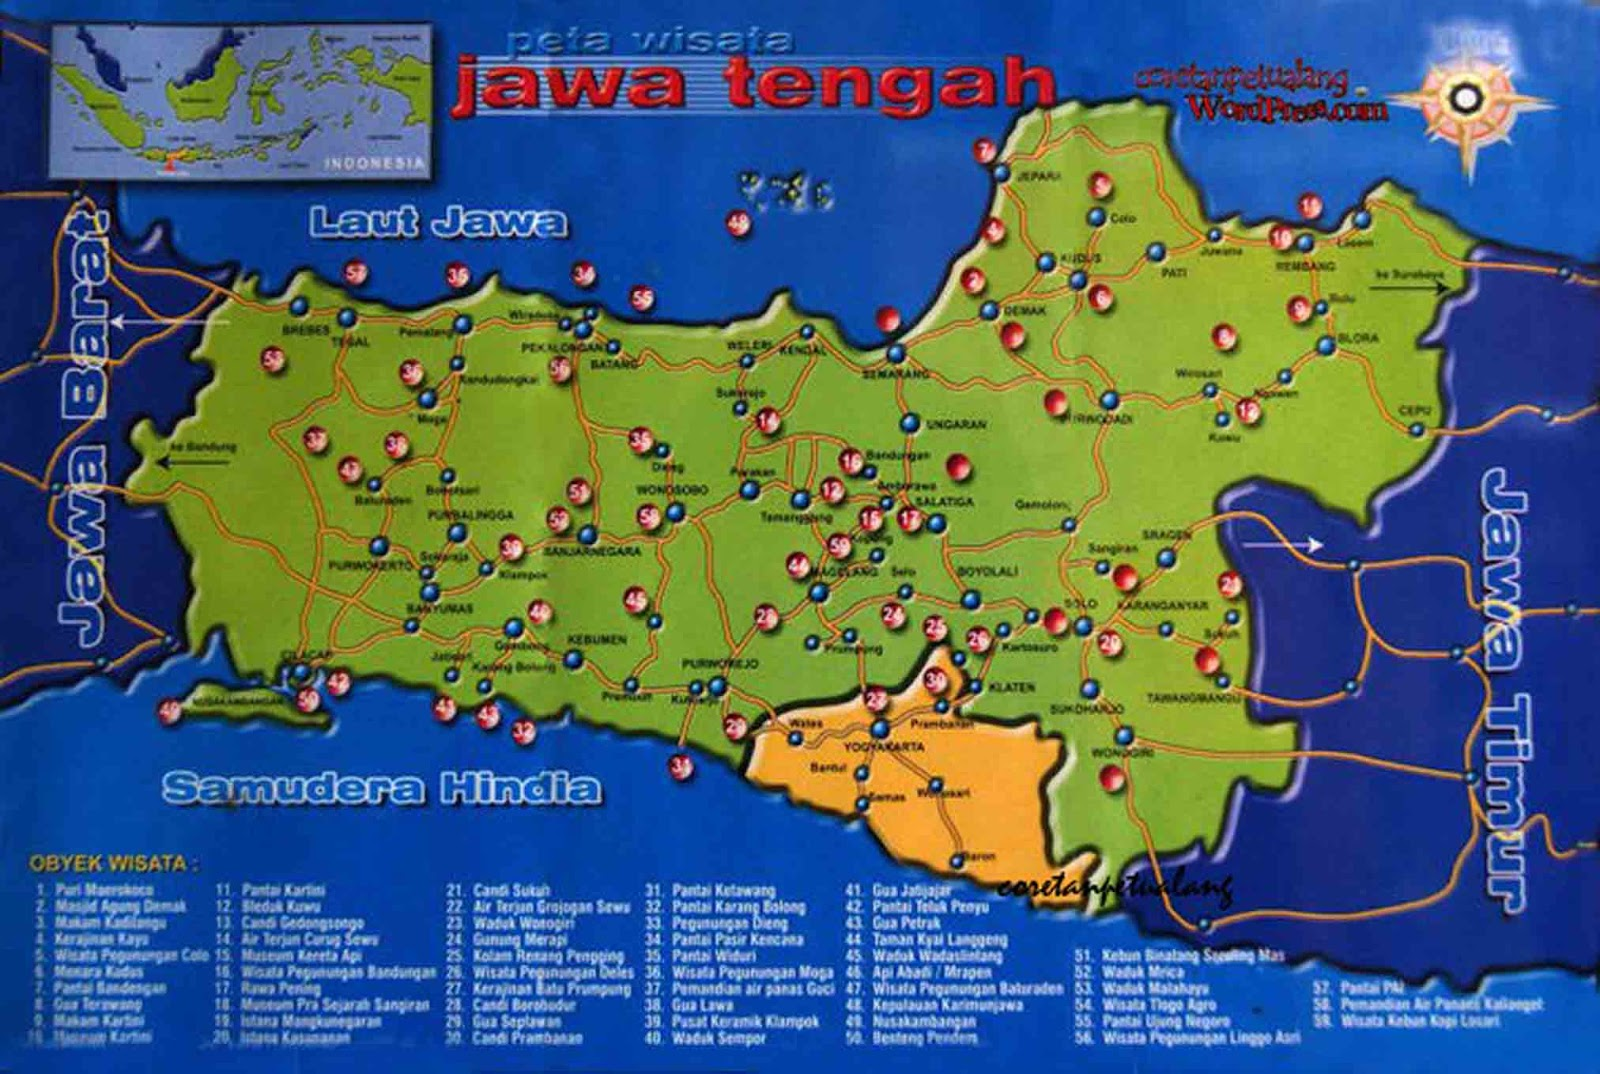 > Peta Lengkap Indonesia: Peta Wisata Jawa Tengah